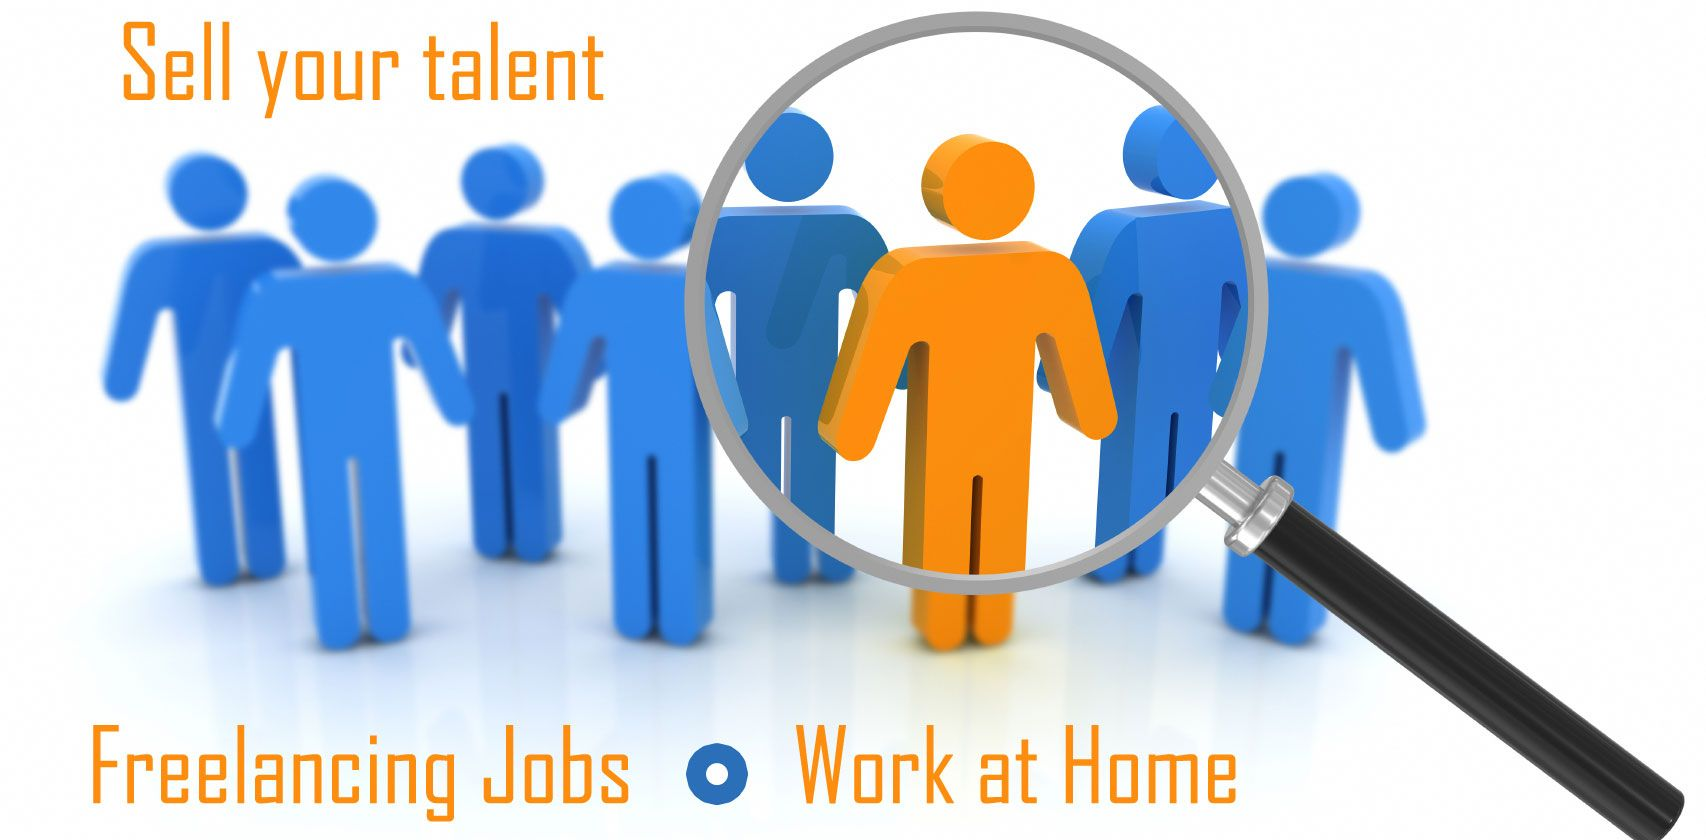 Info Lowongan Kerja Part Time Sabtu Minggu Yang Dapat Anda Lakukan Desarrollo Organizacional Buscador De Empleo Rr Hh